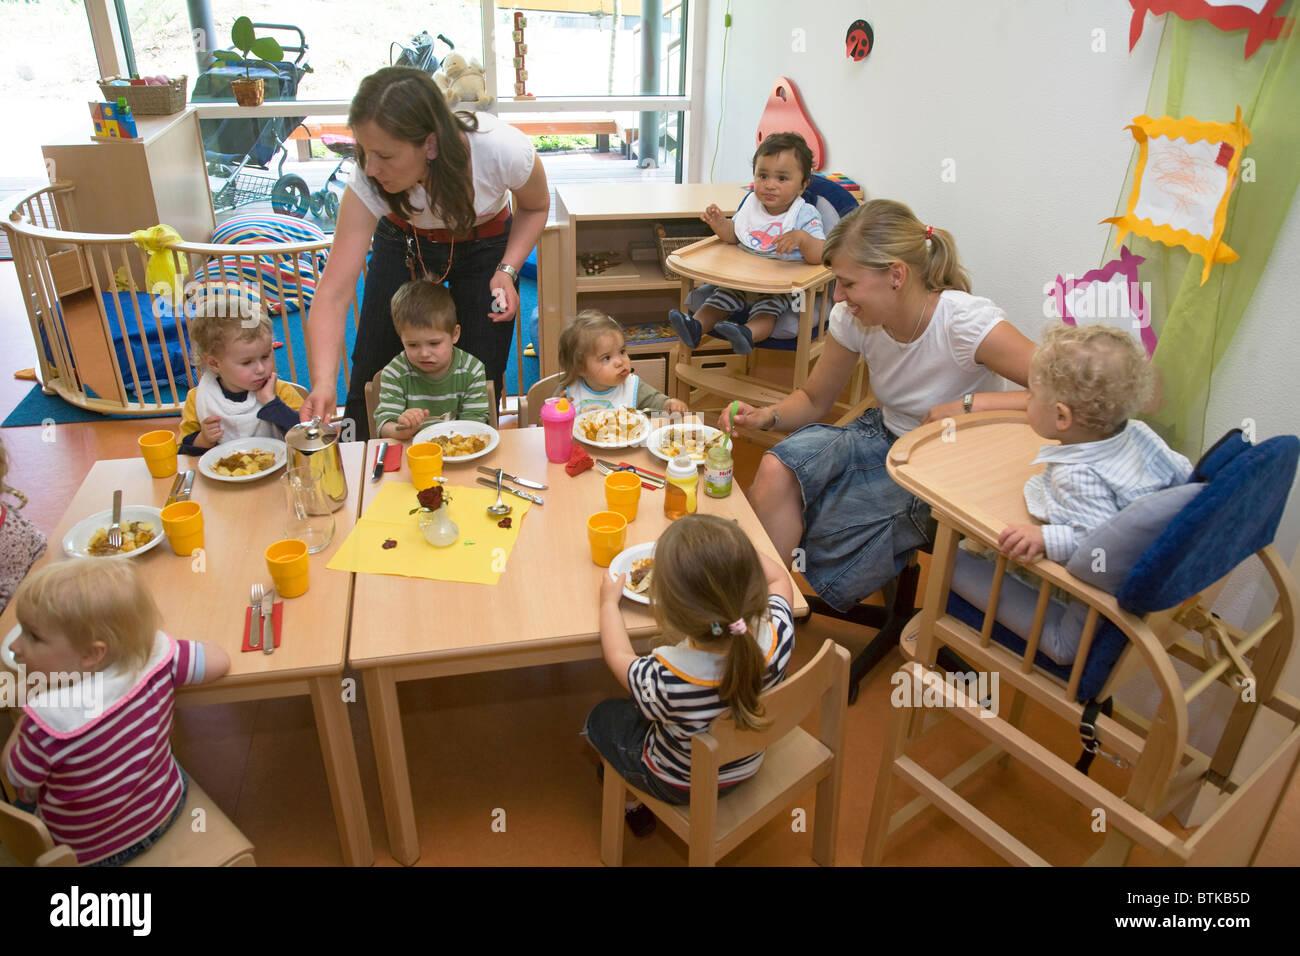 The company kindergarten of Metro, Duesseldorf, Germany